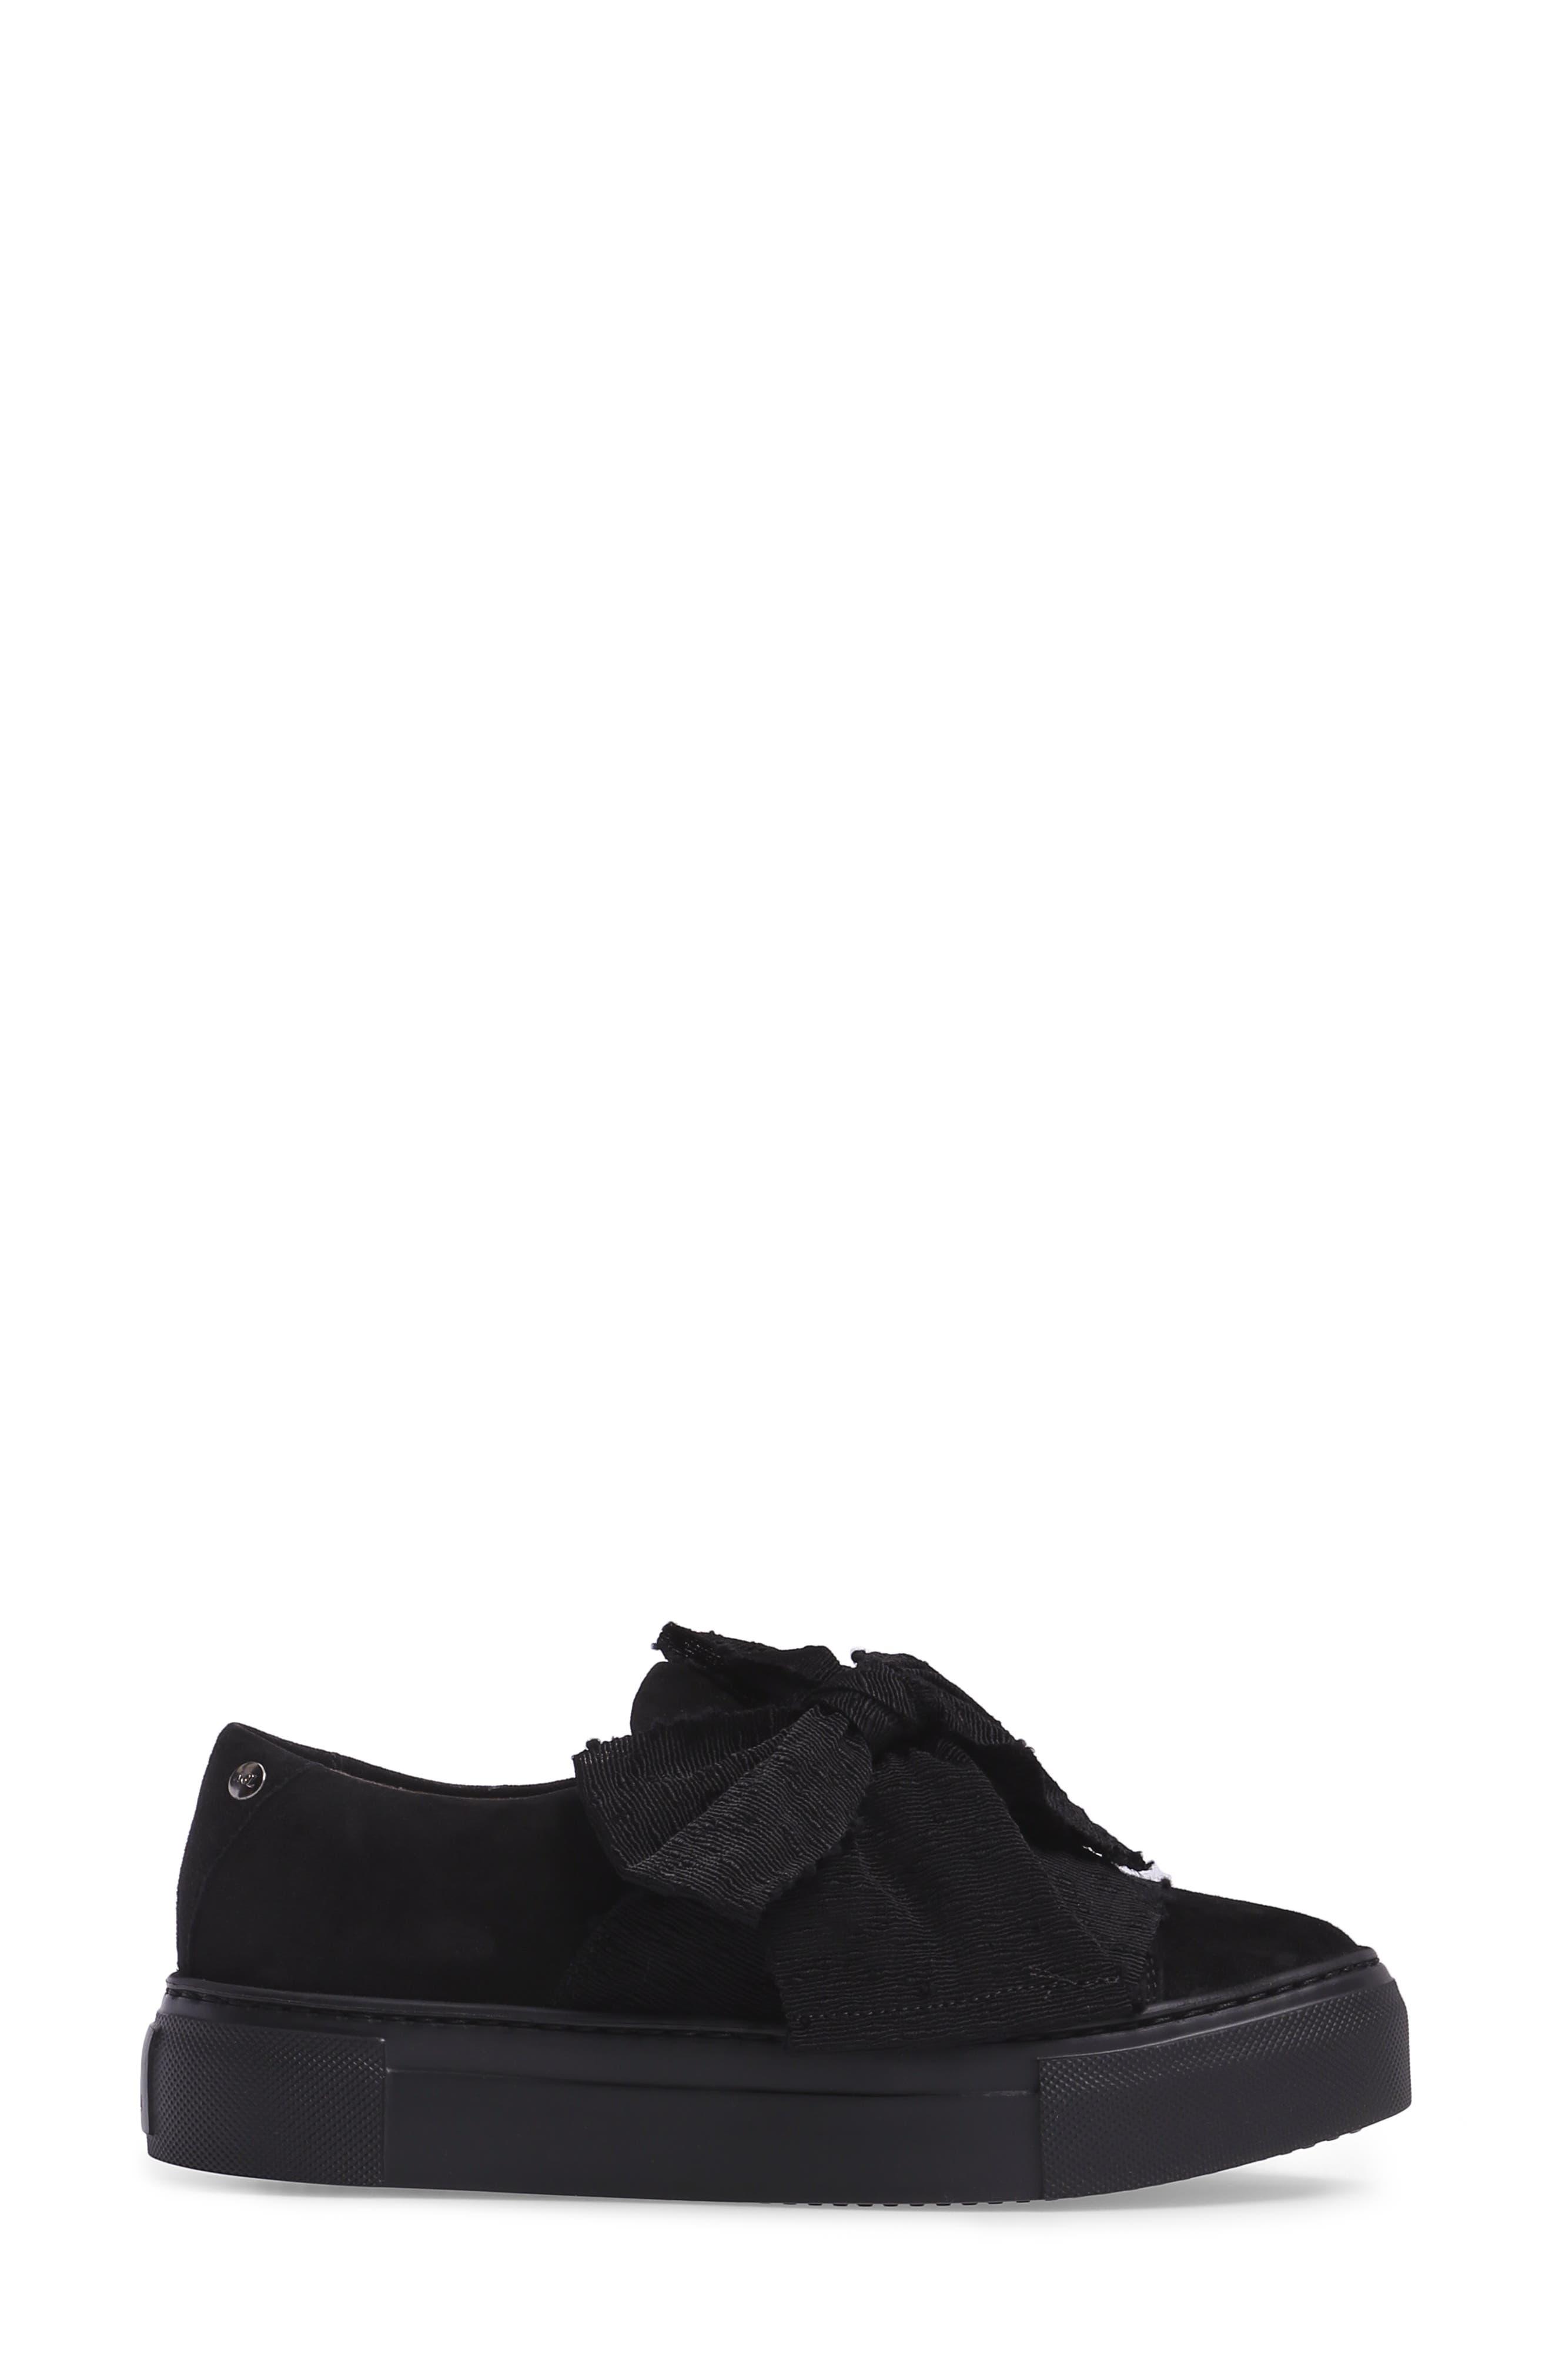 Bow Platform Sneaker,                             Alternate thumbnail 3, color,                             002